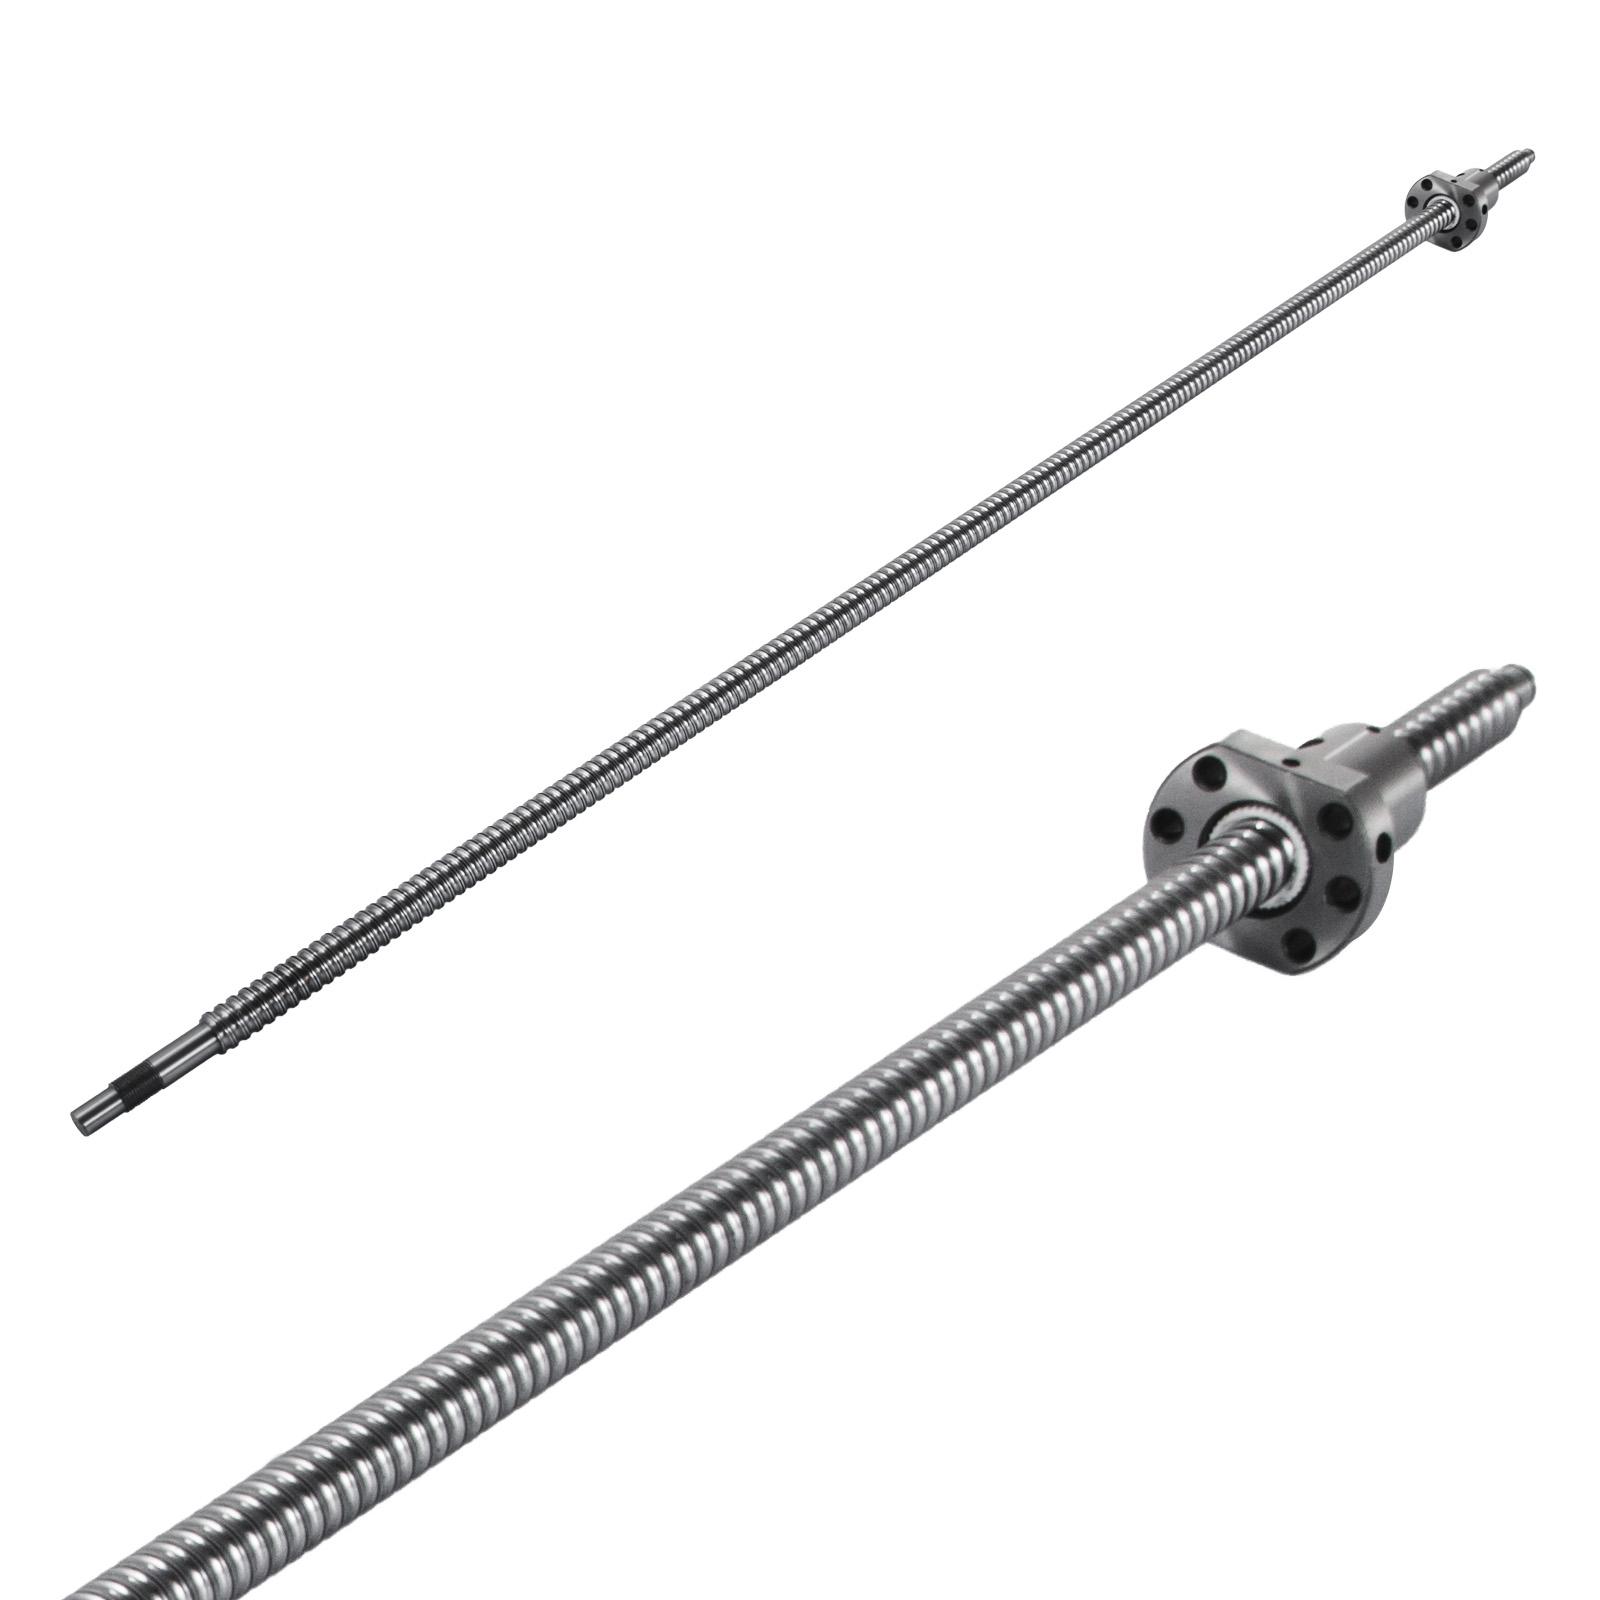 1 Set RM1605-1000mm Anti-backlashed Ballscrew&BF12/BK12